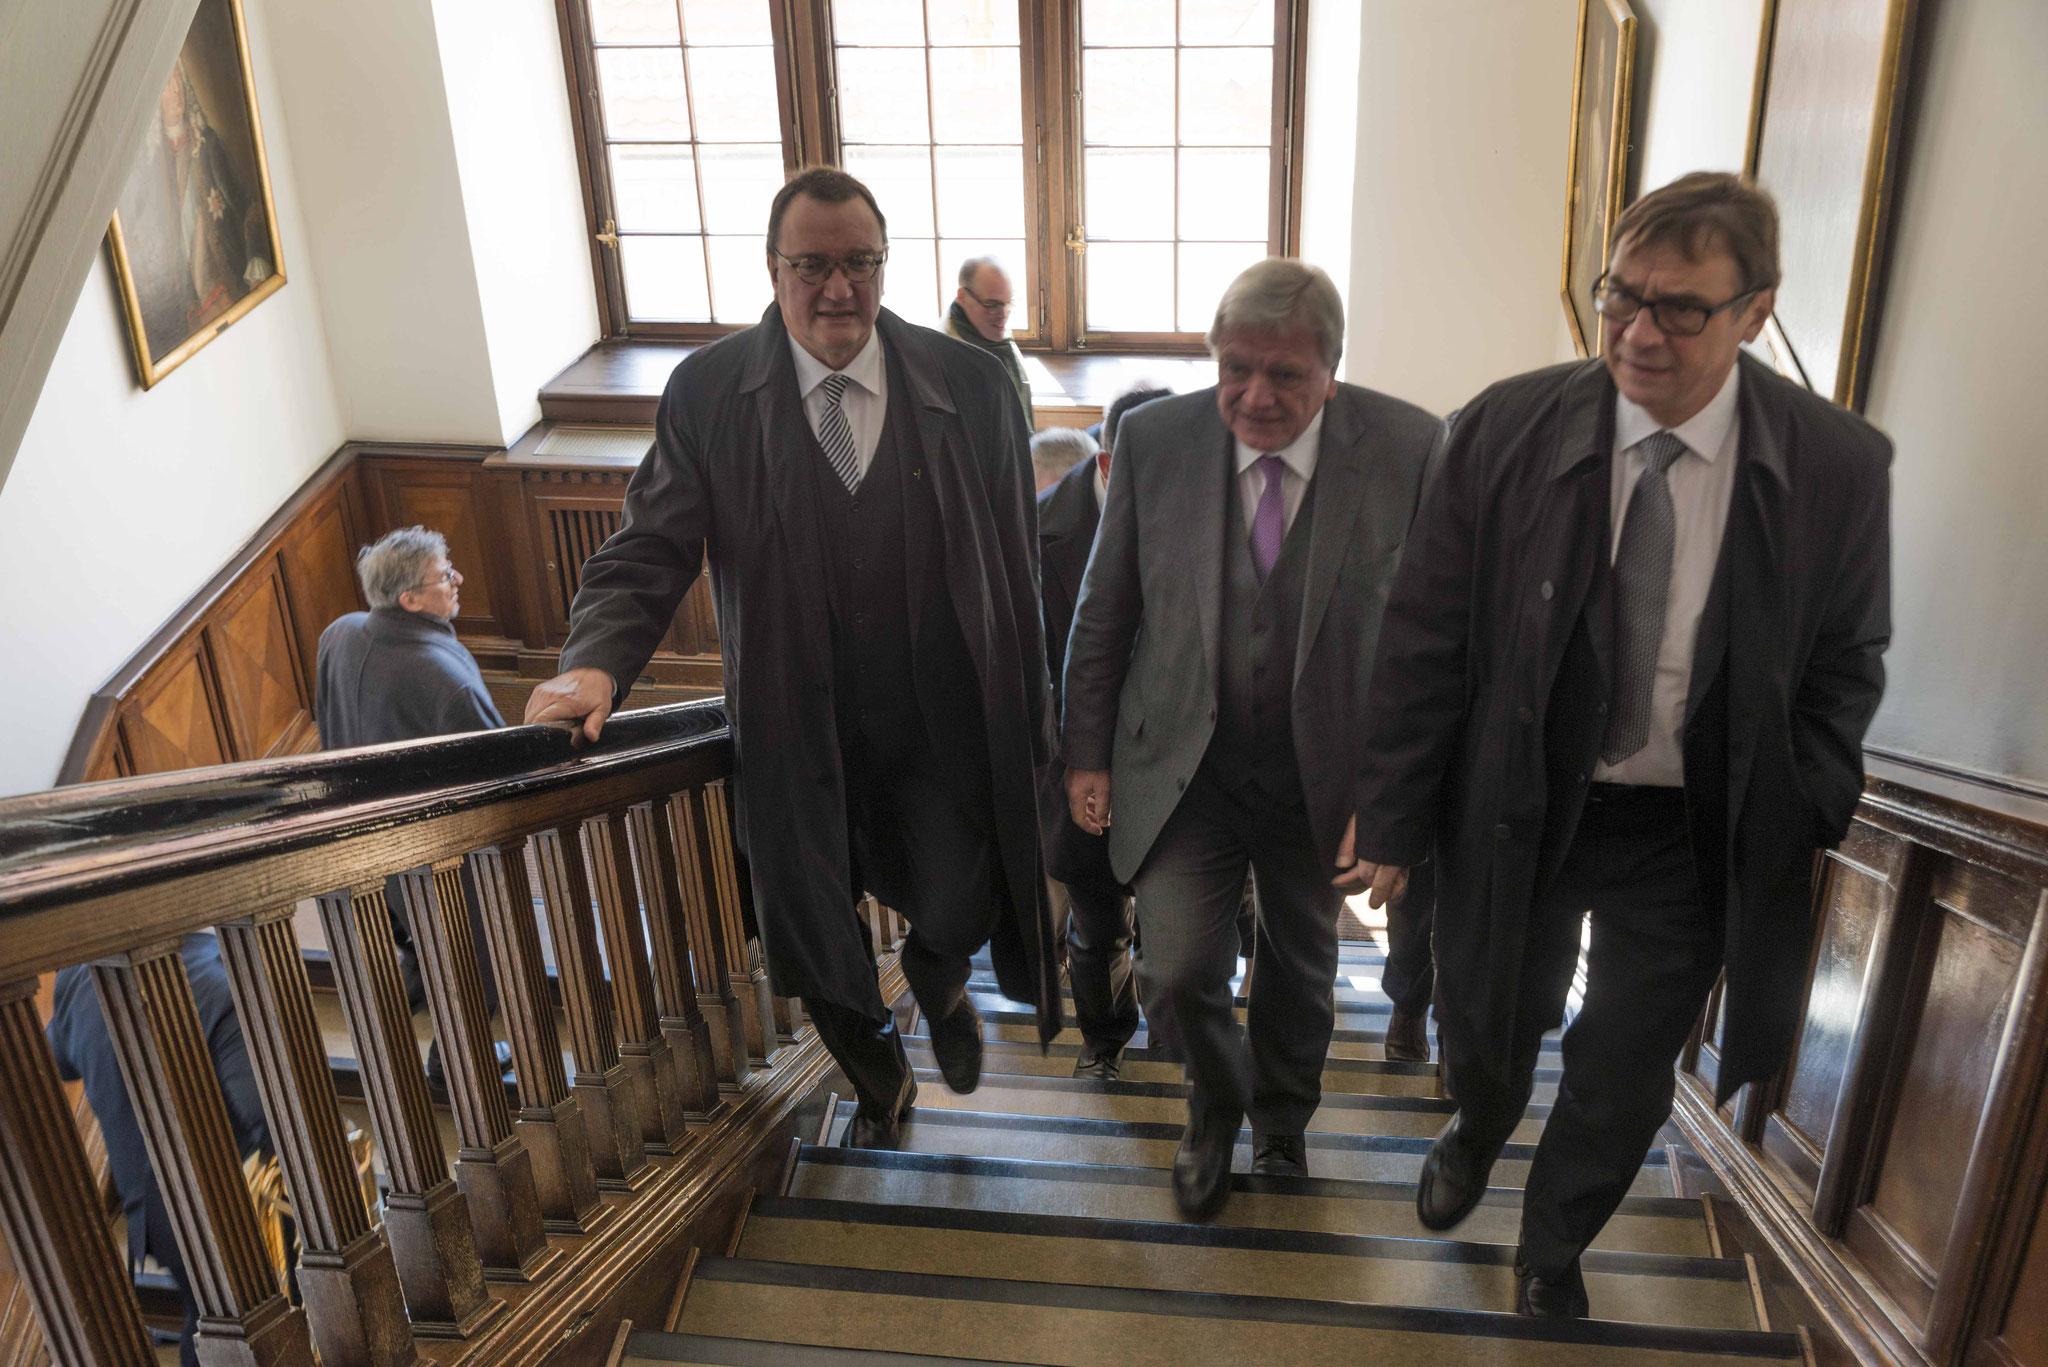 Ankunft im Rathaus: Bischof Prof. Dr. Hein, Ministerpräsident Volker Bouffier, Kirchenpräsident Dr. Dr. h.c. Volker Jung